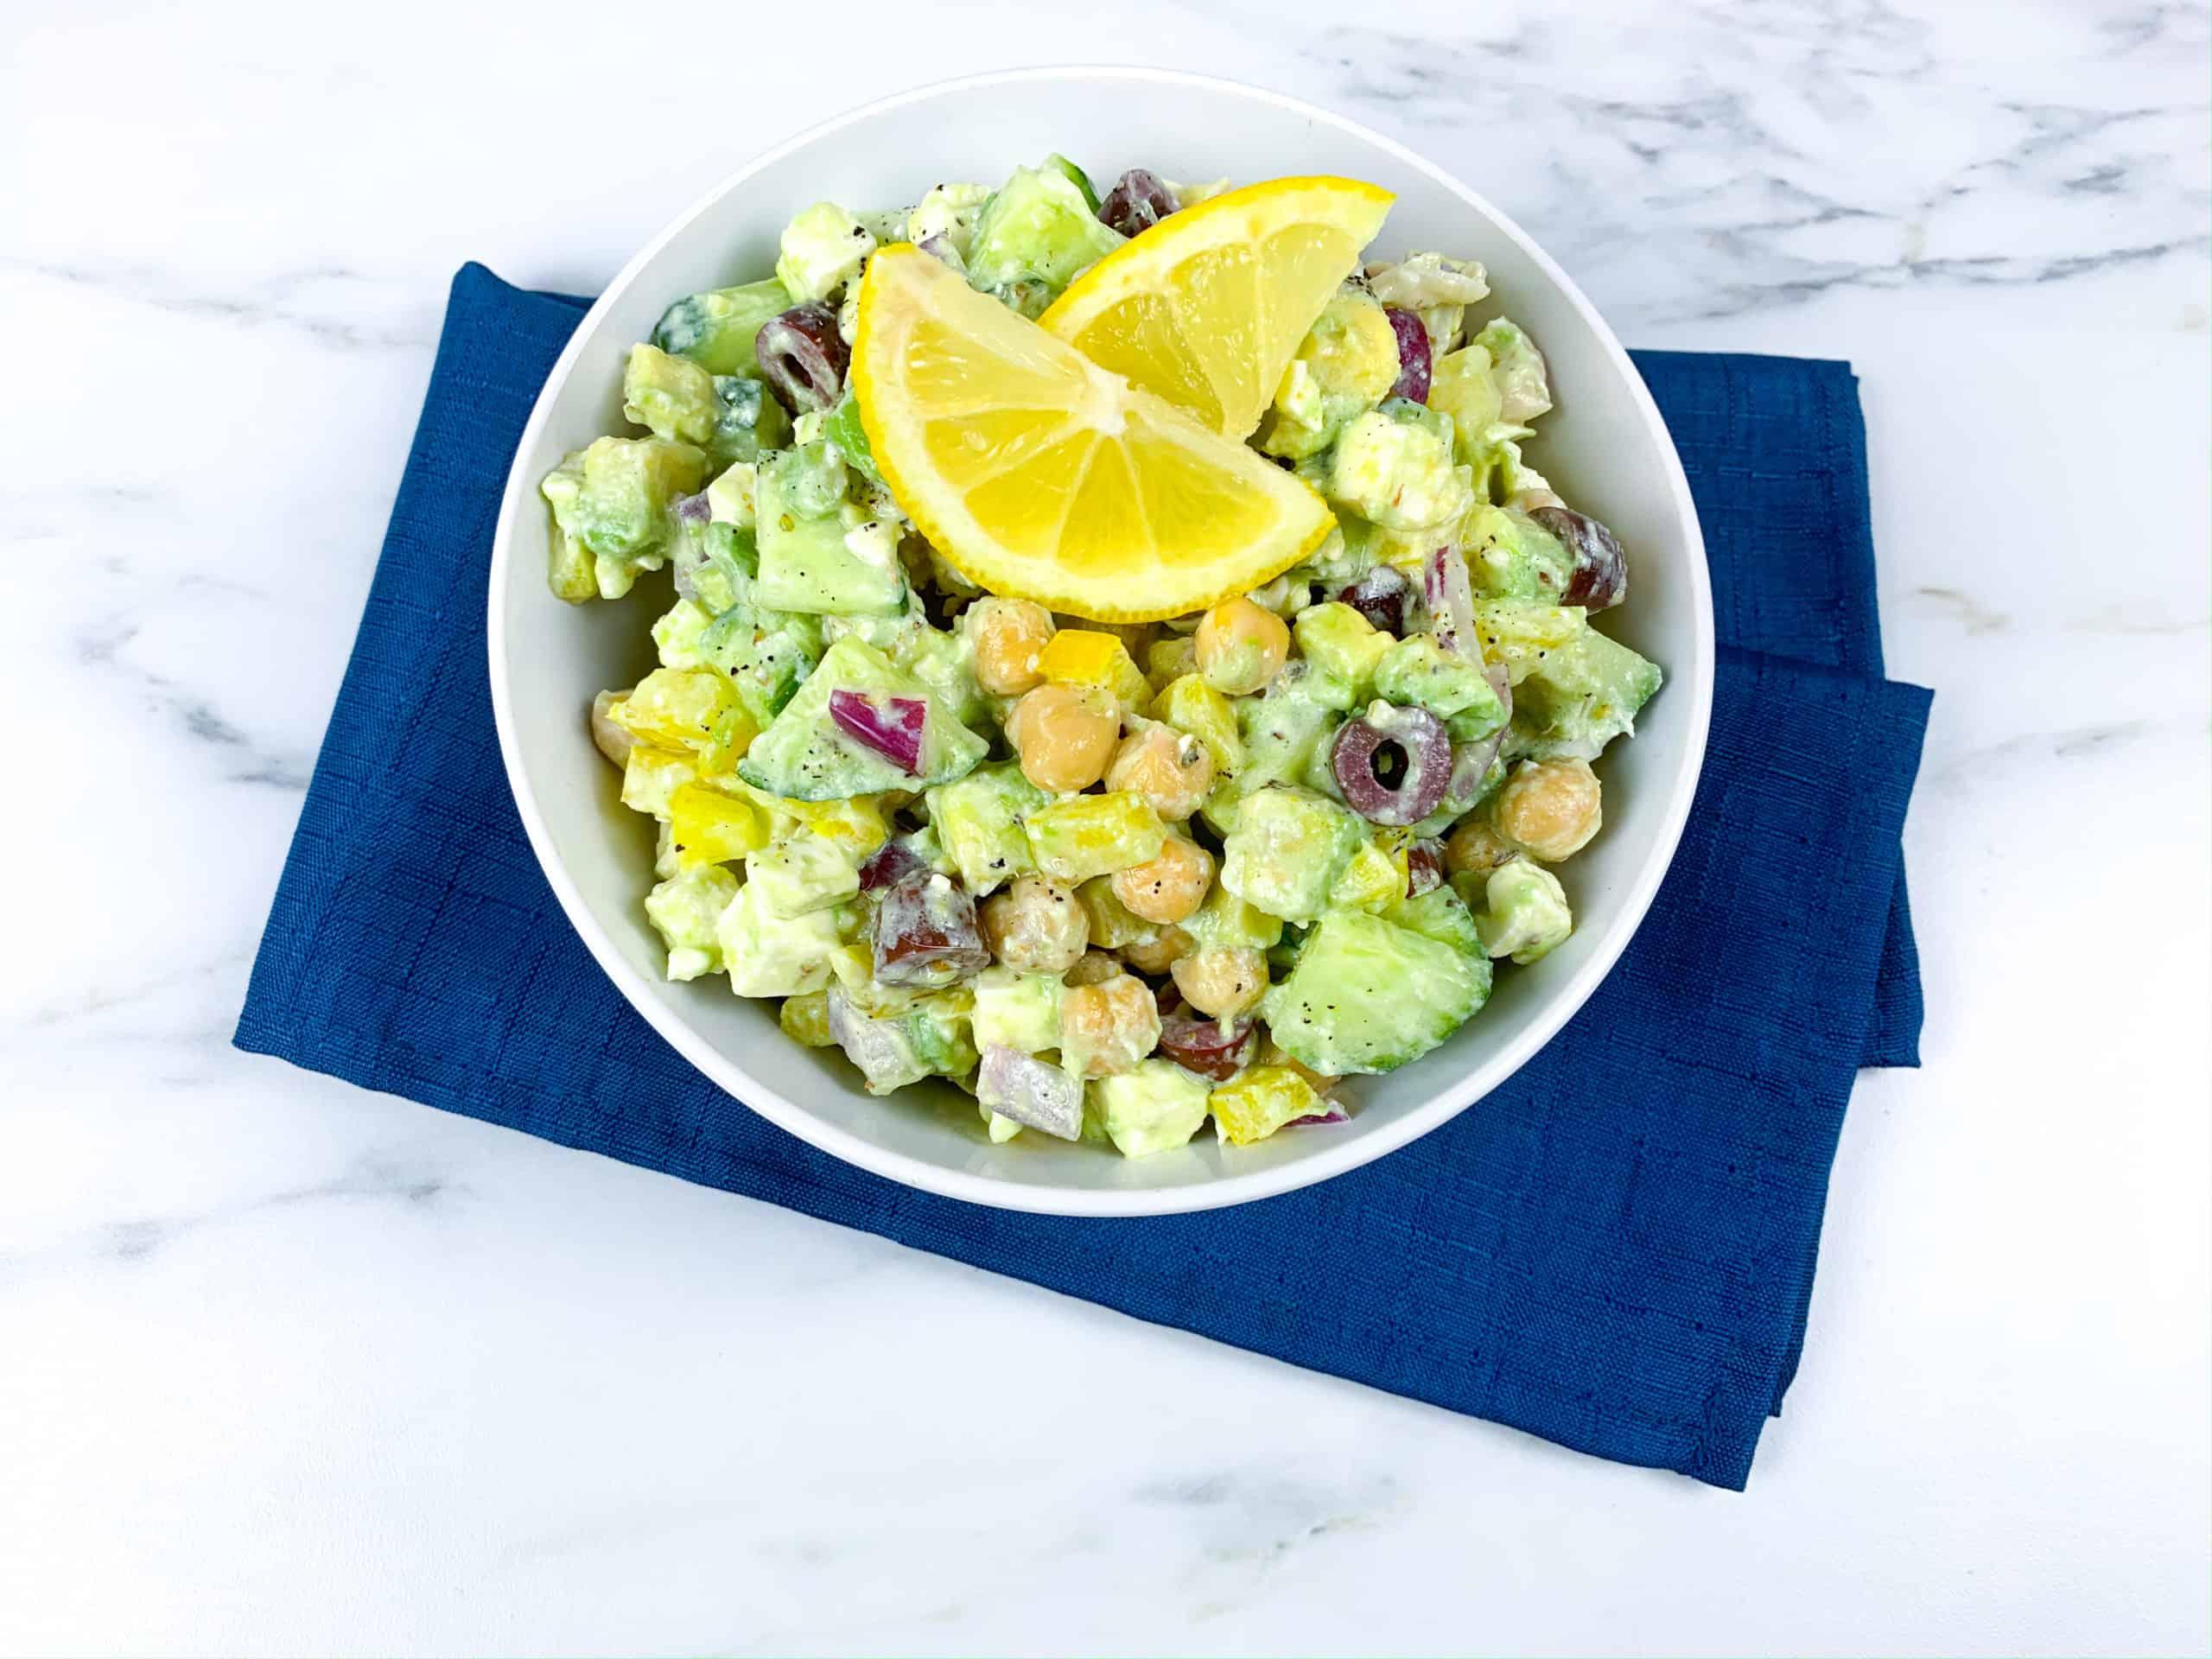 Healthy avocado, chickpeas, feta, and cucumber salad recipe